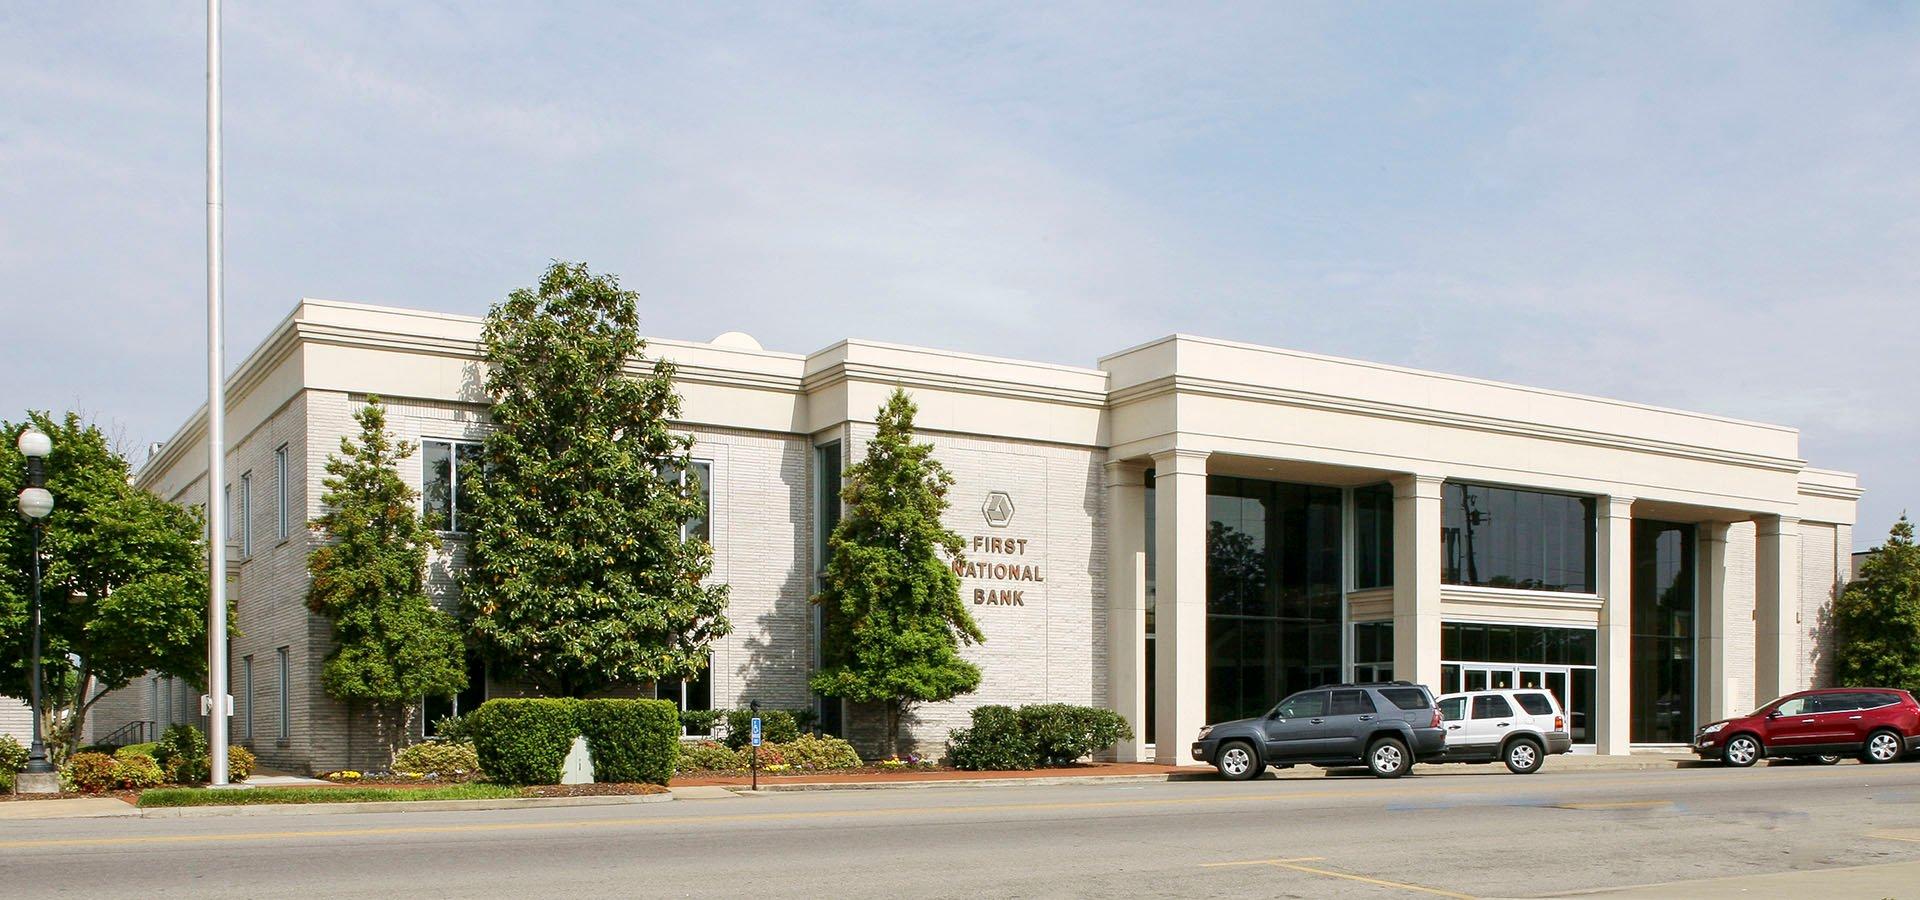 First National Bank of Pulaski   Pulaski, Tennessee   Brindley Construction, LLC.